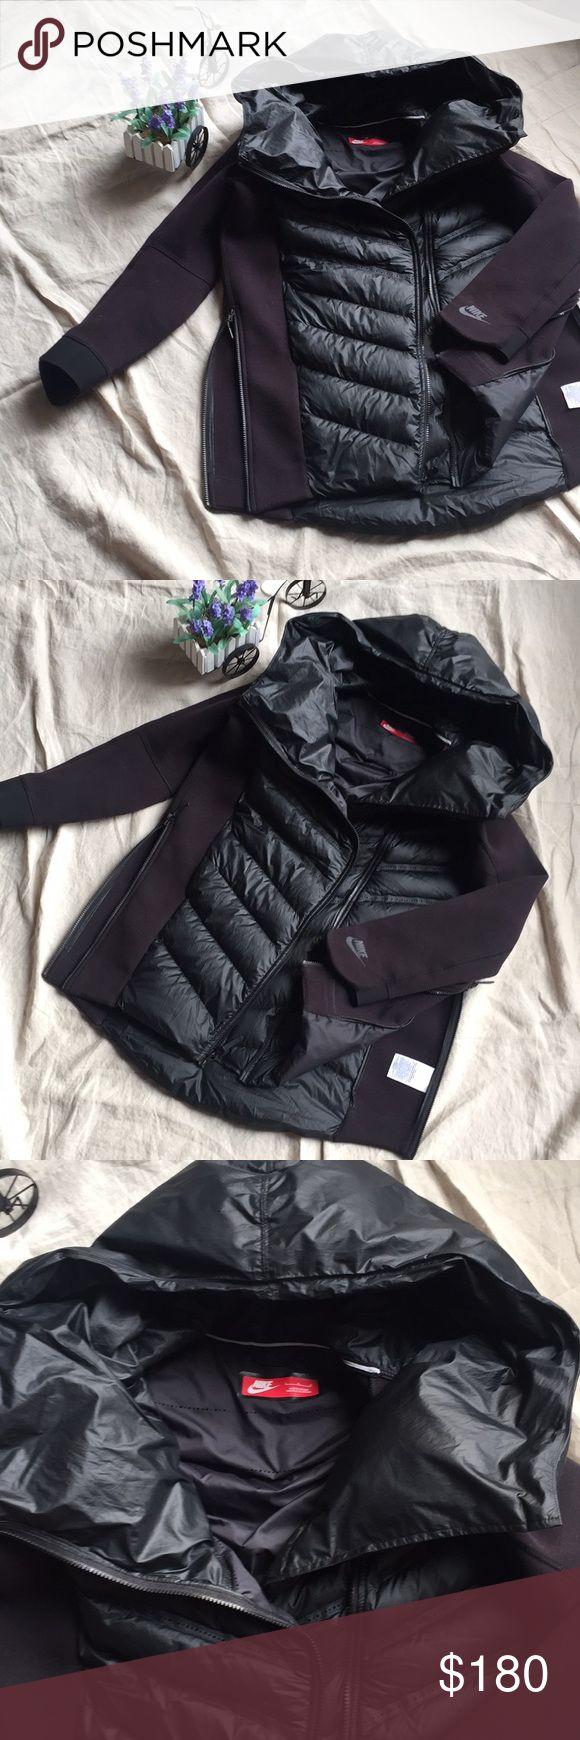 New Nike winter coat 🌺🌺🌺🌺 🧥 New 800 Nike aeroloft 🌺🌺🌺🌺longer coat 🧥 . Nike Jackets & Coats Pea Coats